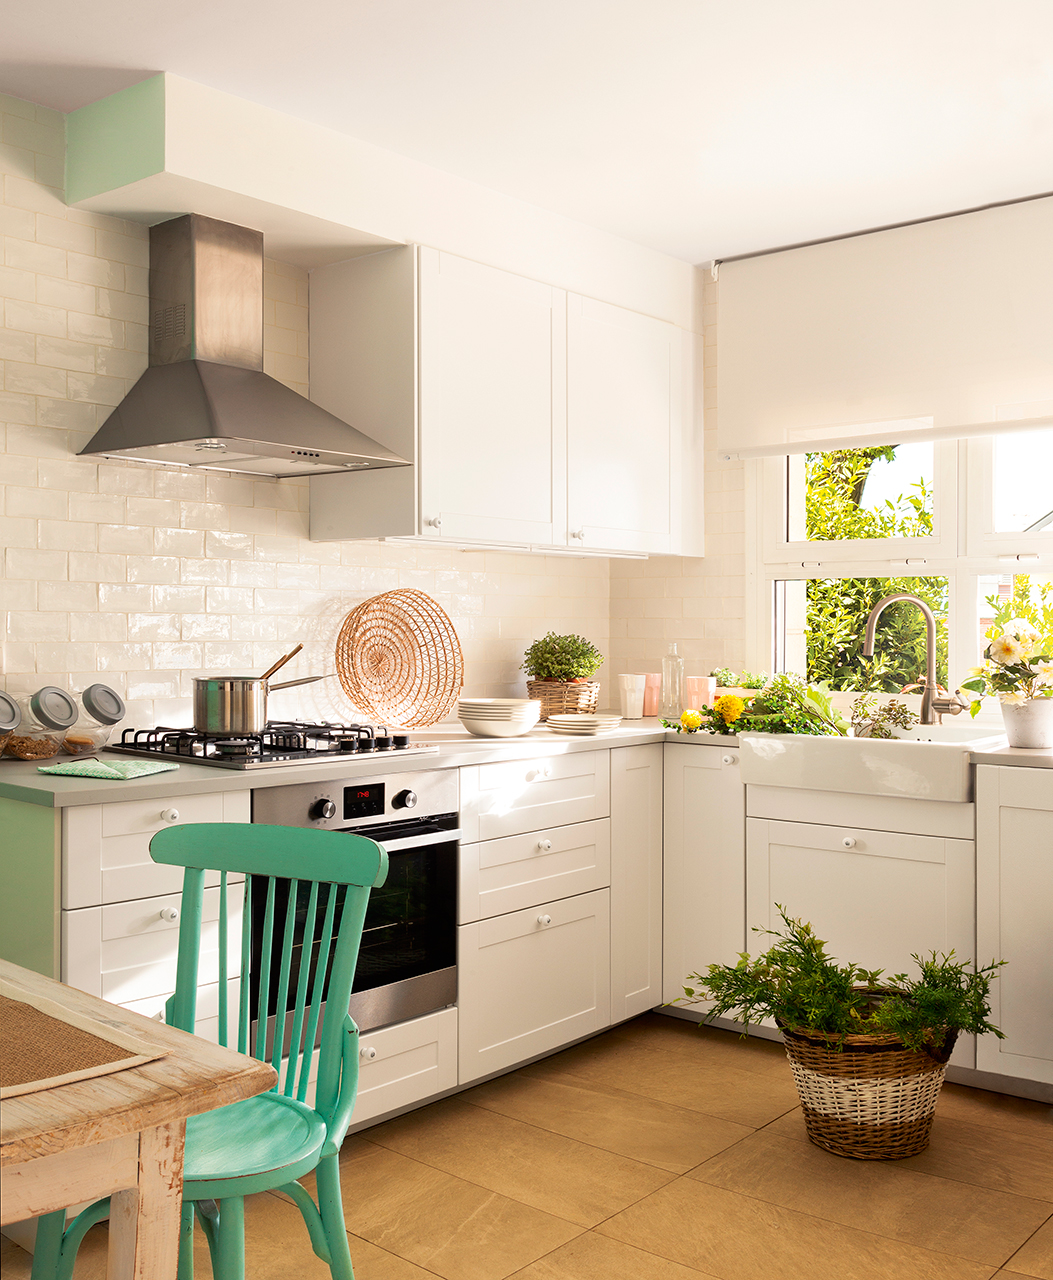 Ideas de decoraci n para cocinas peque as - Electrodomesticos para cocinas pequenas ...